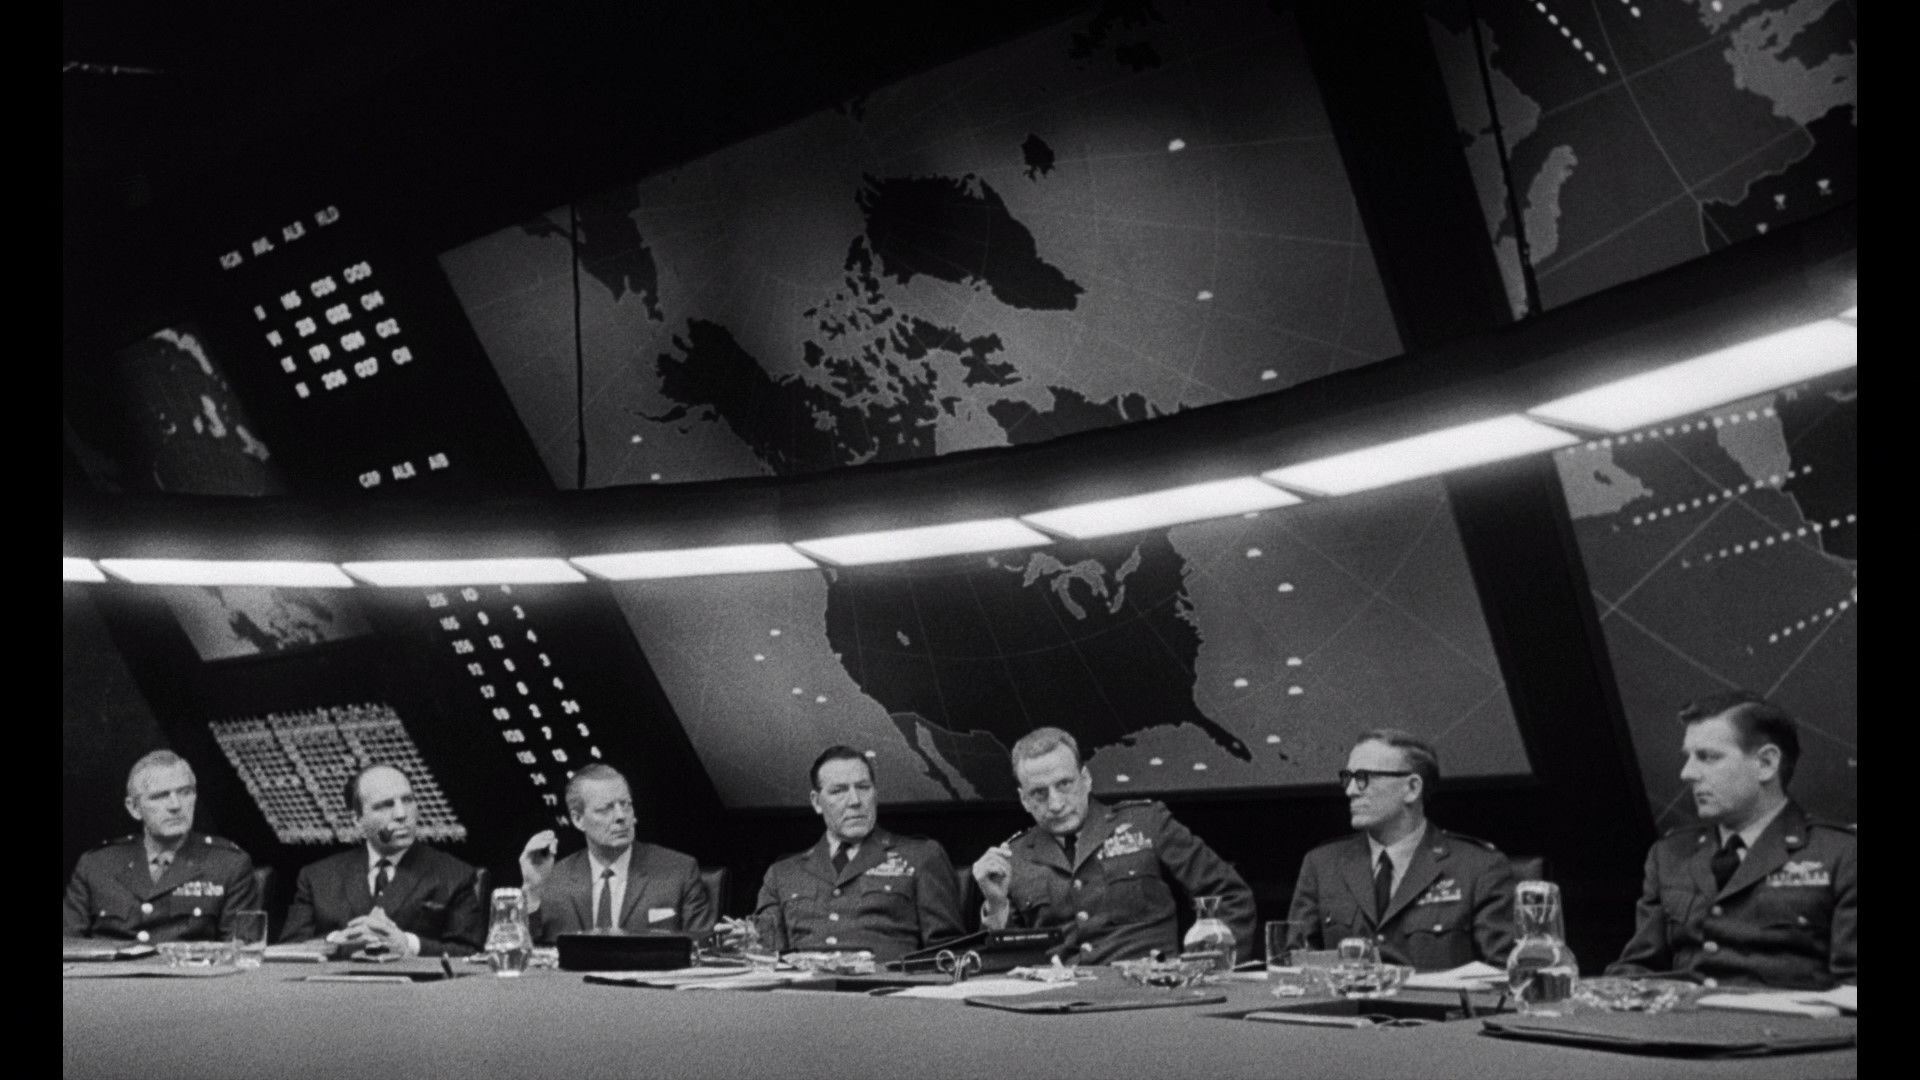 Pepe Escobar Cold War 20  Eurasian emporium or nuclear war  Puppet Masters  Sottnet